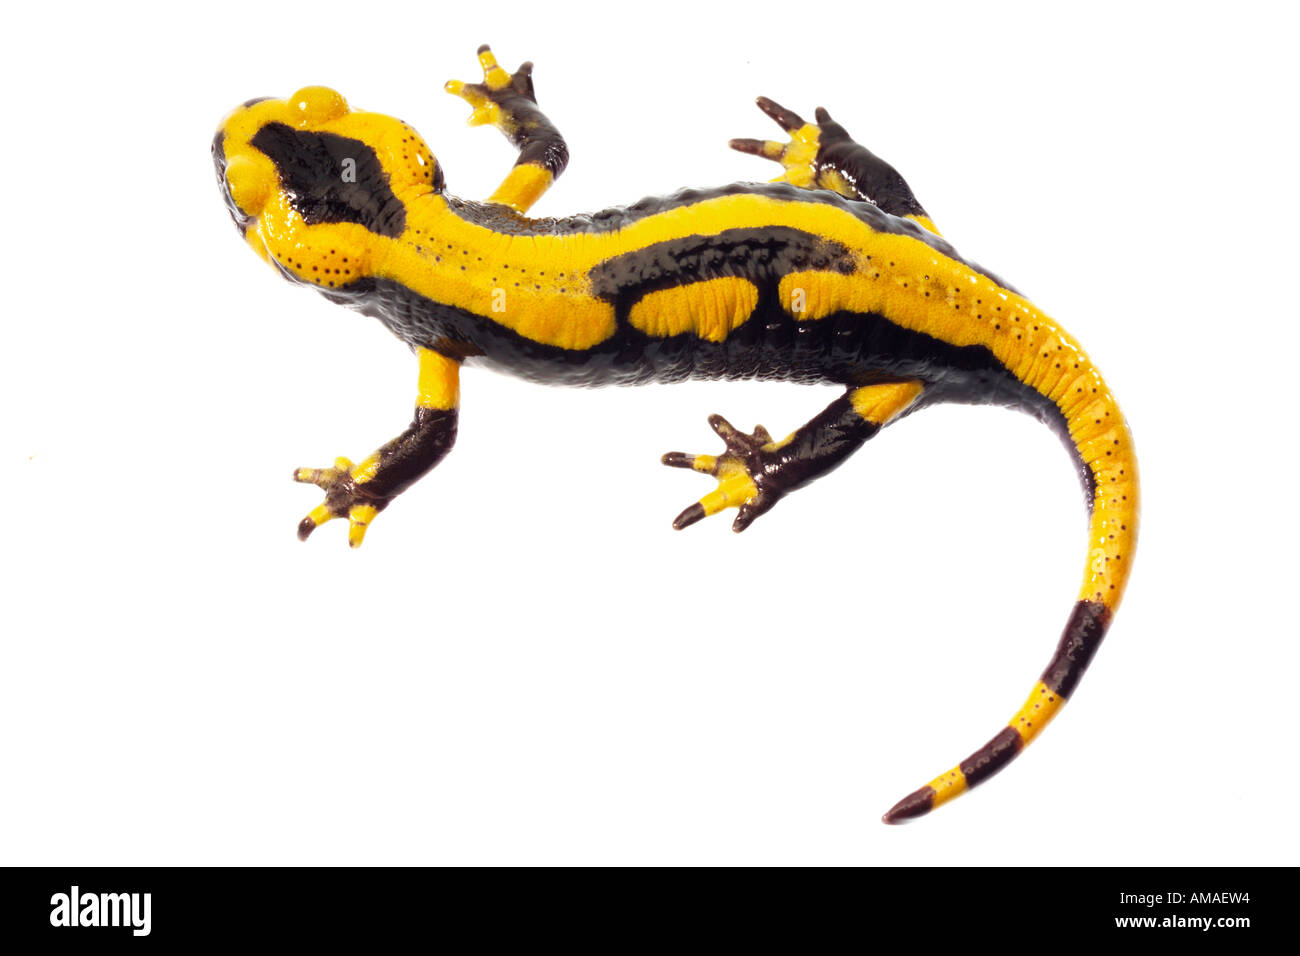 Salamandra Imagen De Stock